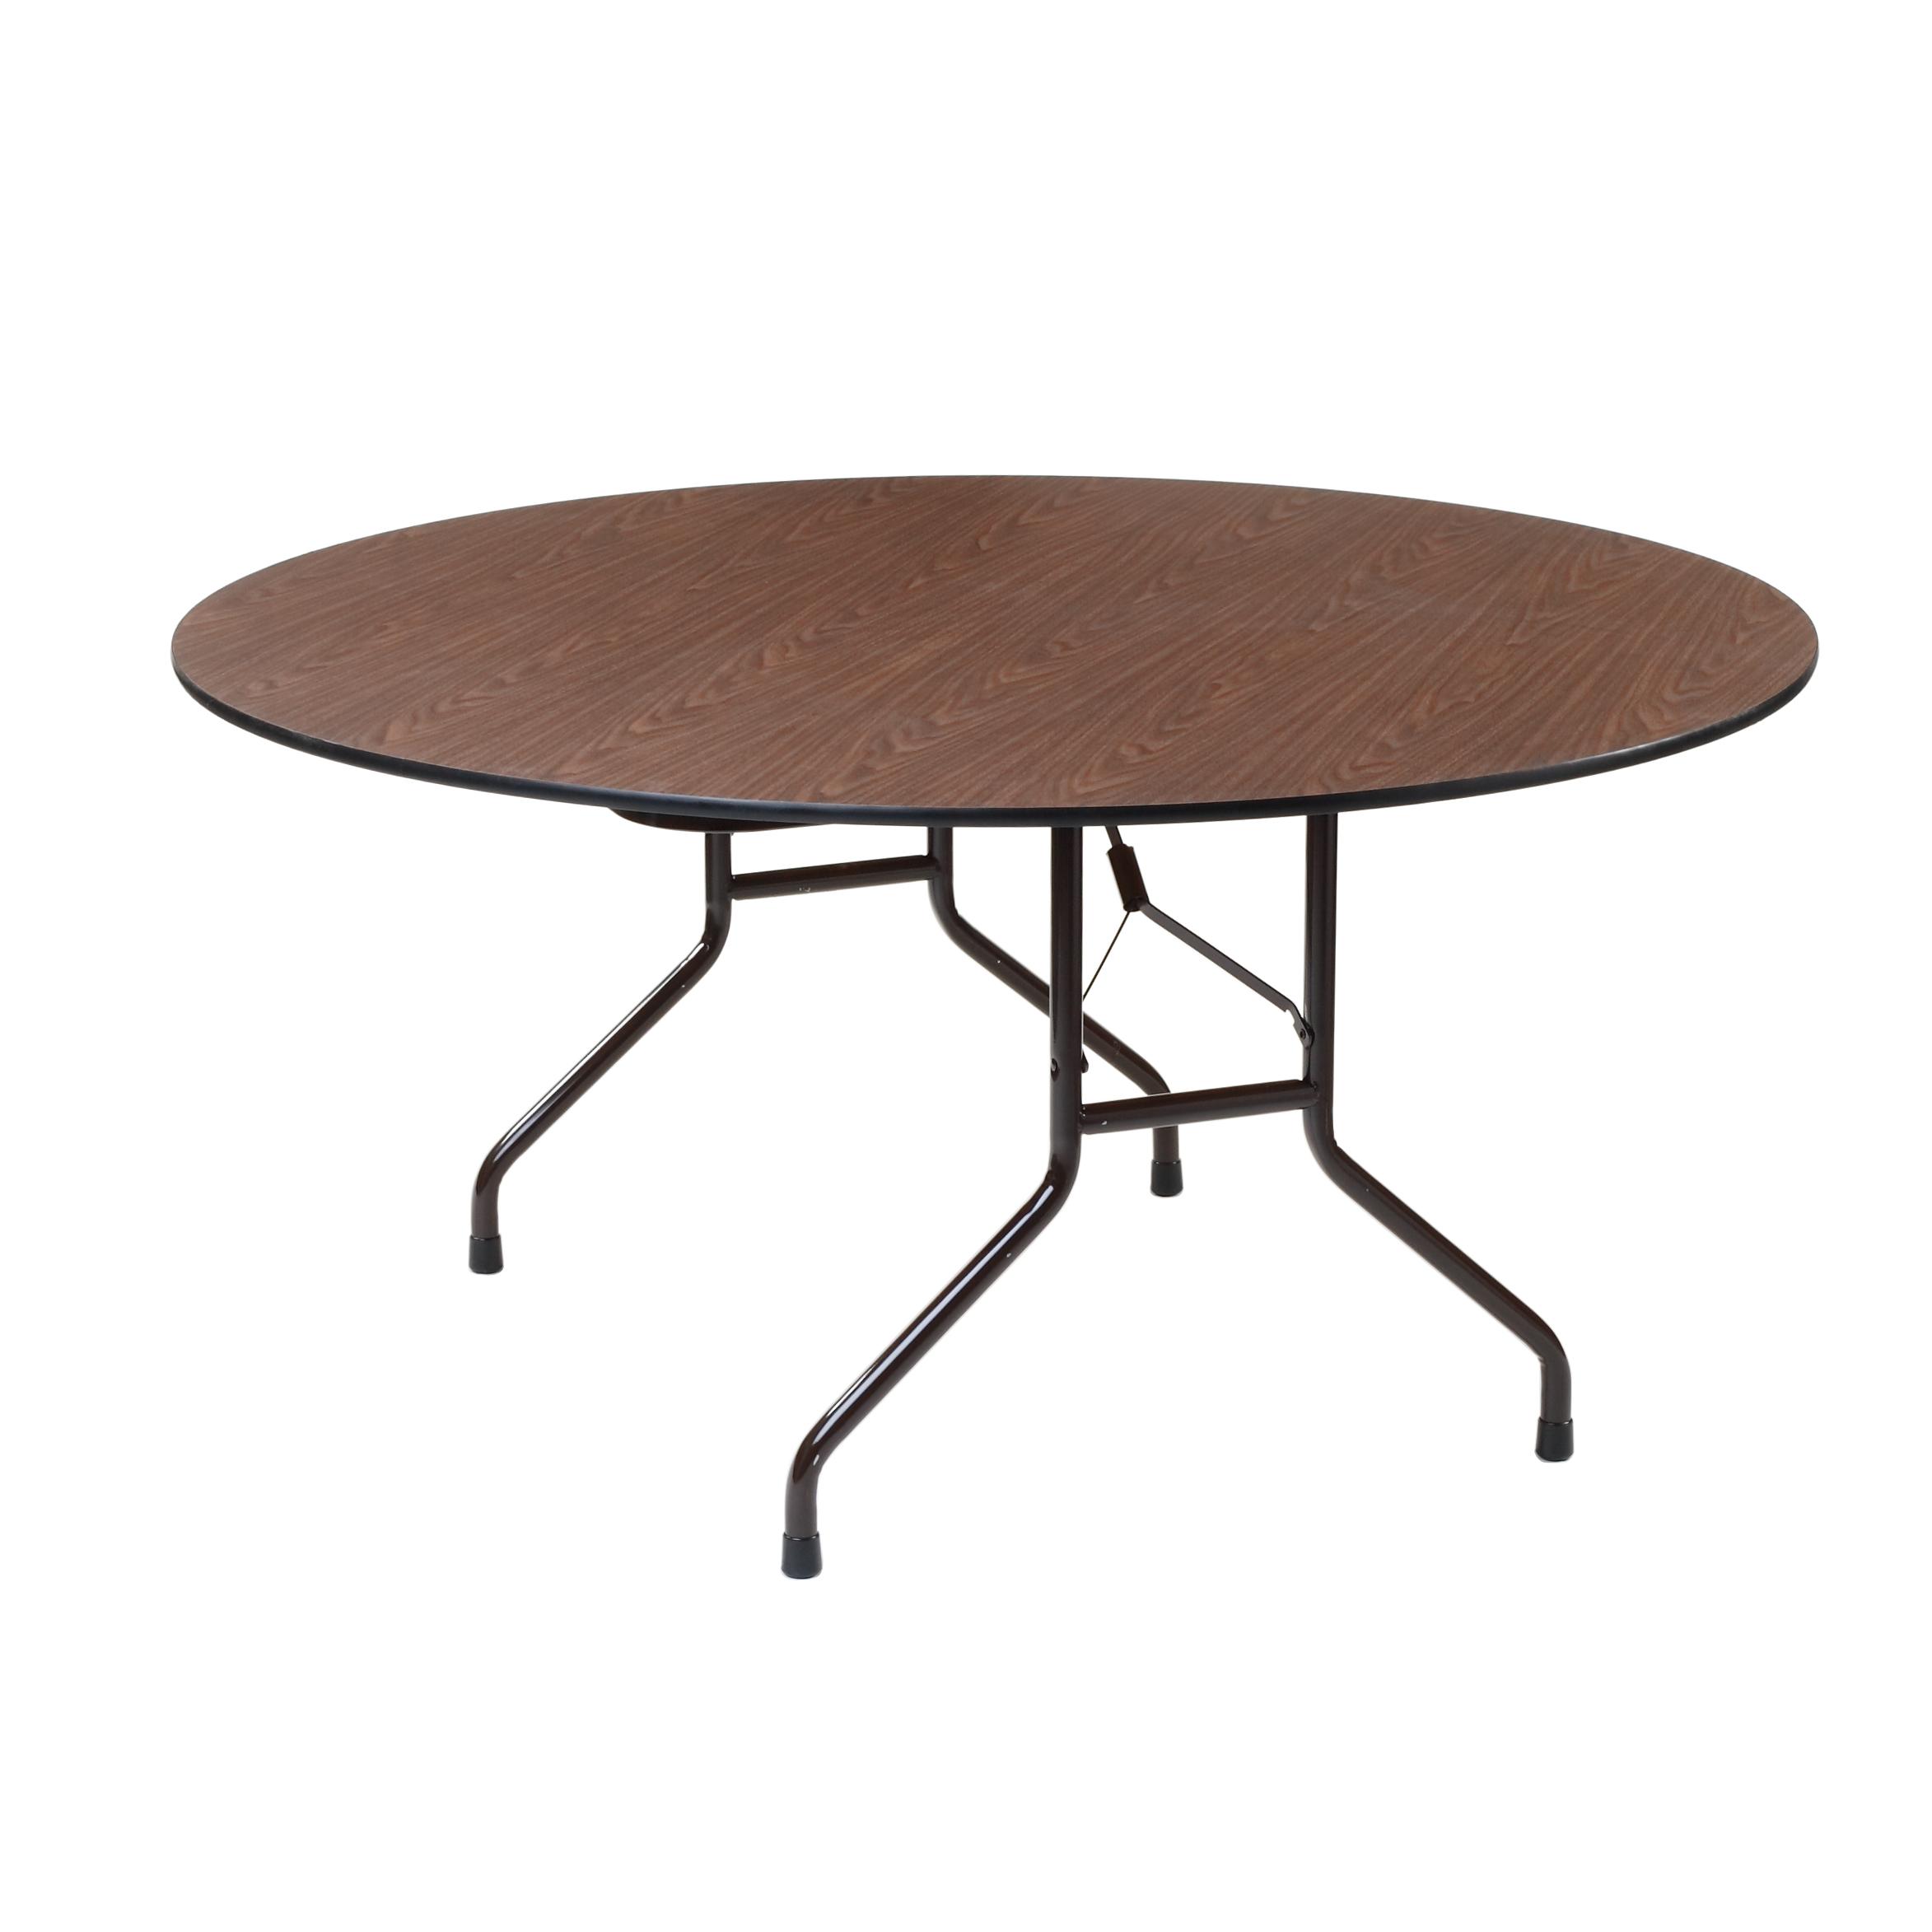 Royal Industries COR BT 60 R folding table, round